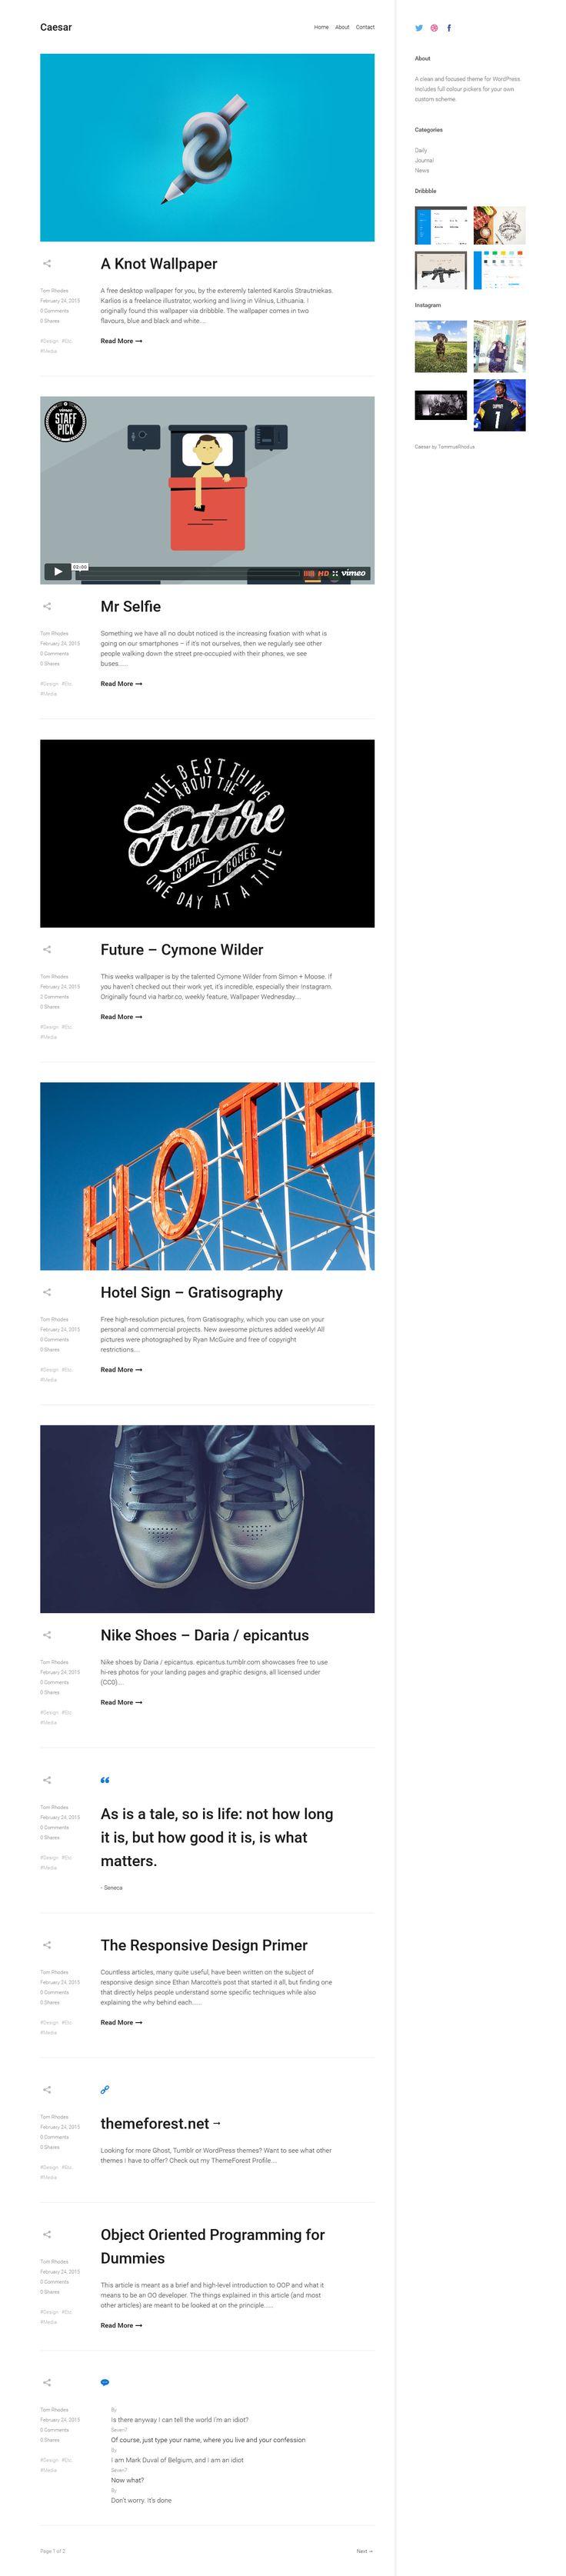 Caesar - A Clean and Focused WordPress Blog Theme #web #wordpress Demo and Download: http://ksioks.com/portfolio/caesar-a-clean-and-focused-wordpress-blog-theme/